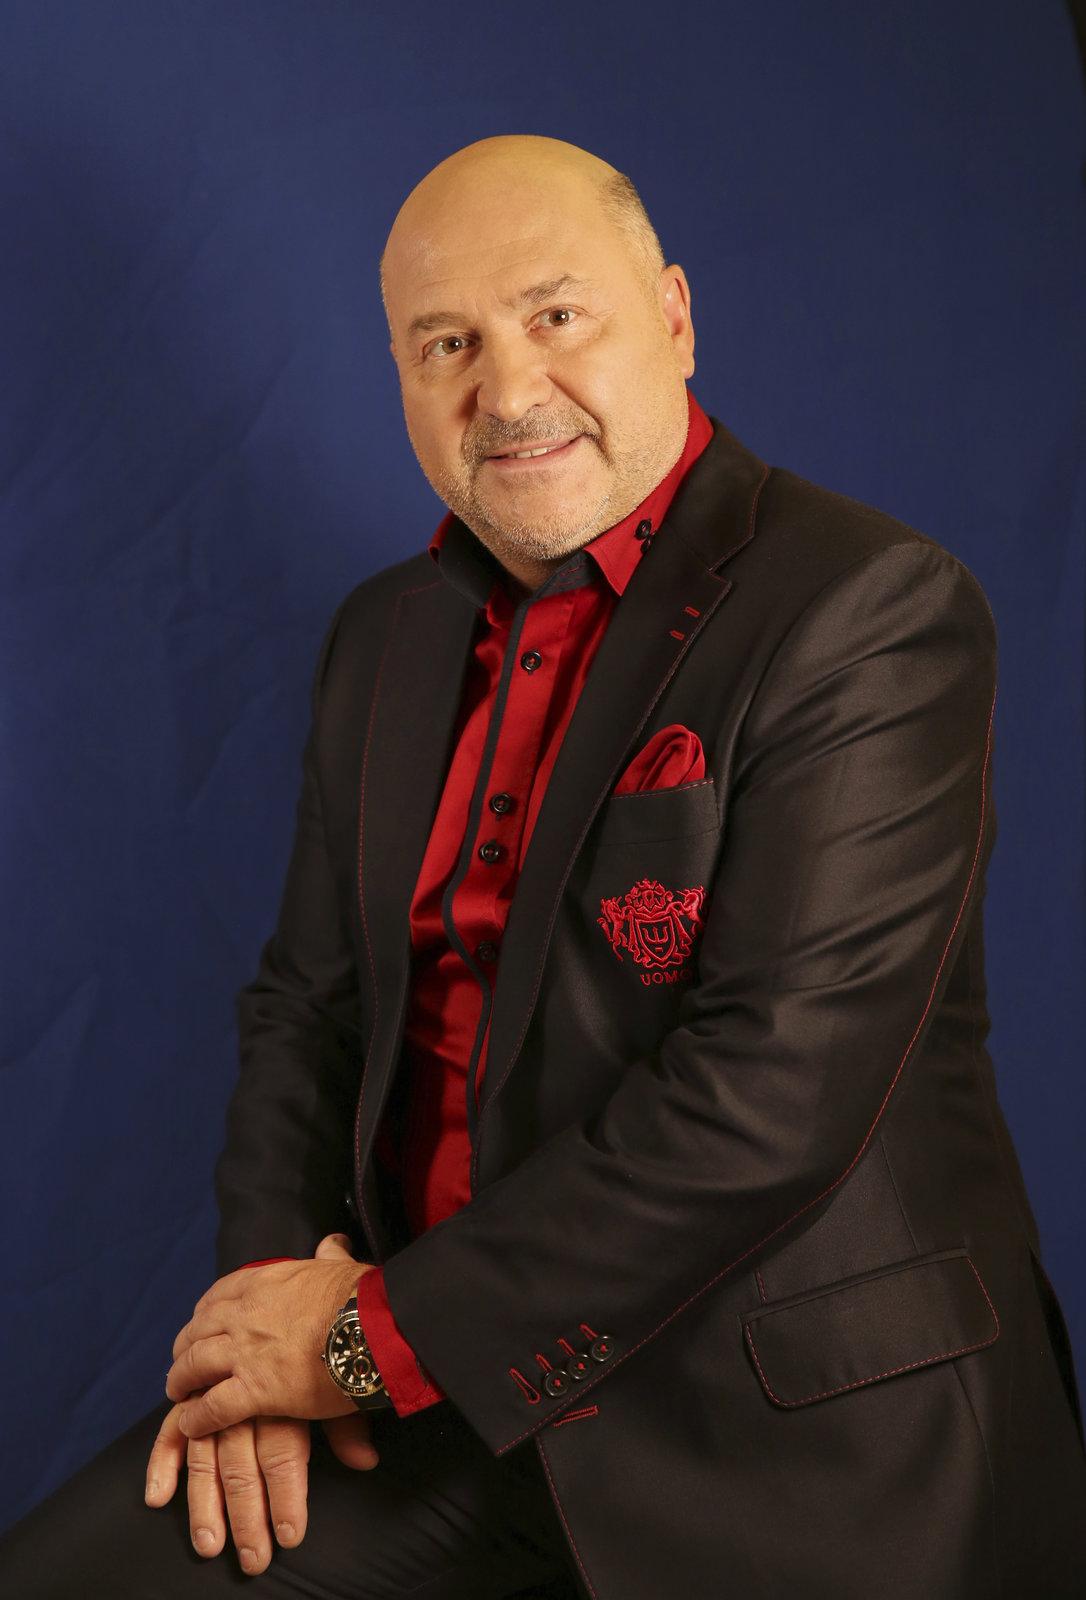 Michal David alias Michal Štancl